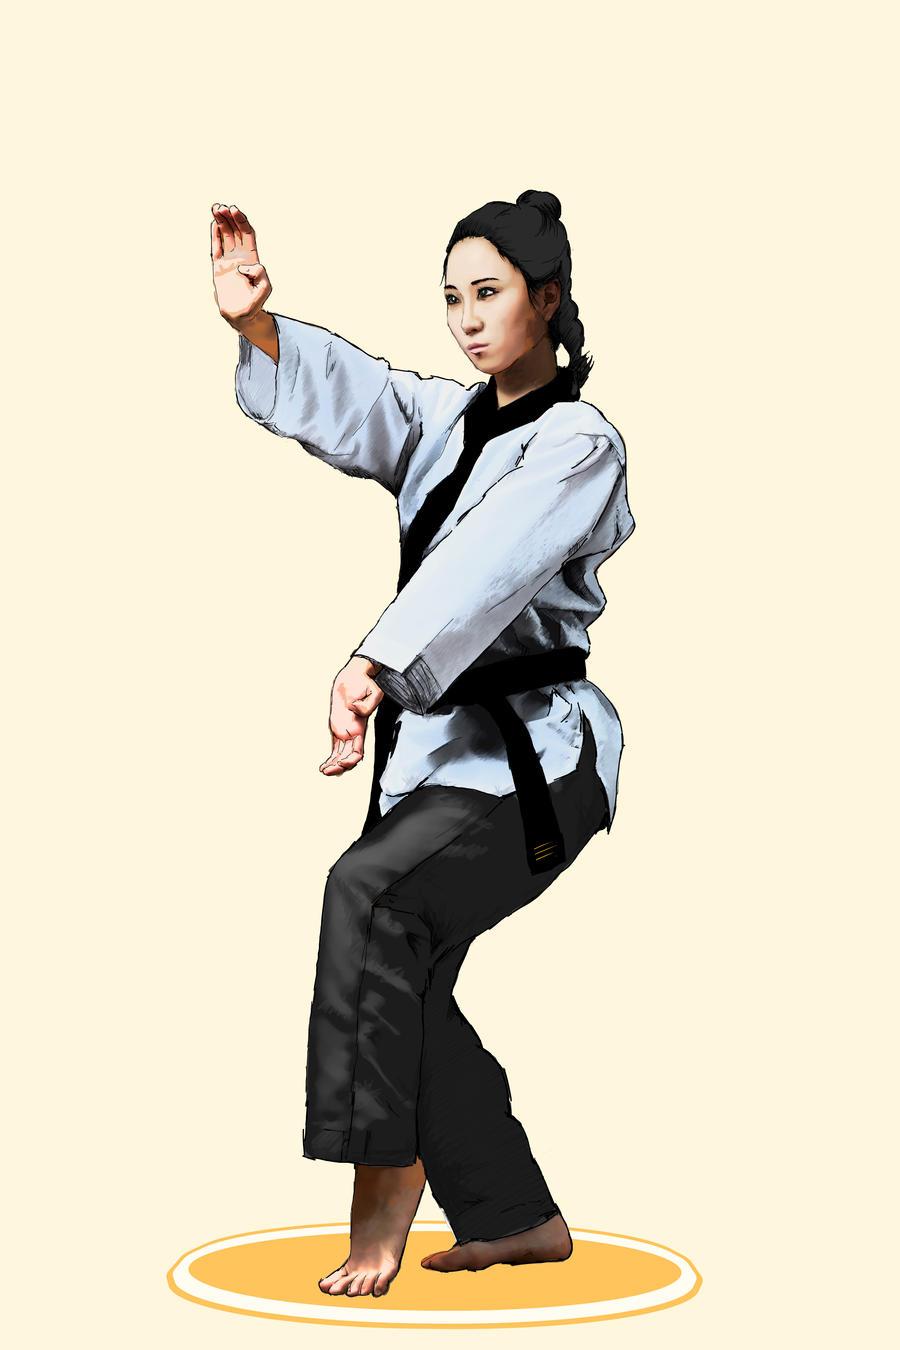 52 <b>Martial Arts</b> HD <b>Wallpapers</b> | Backgrounds - <b>Wallpaper</b> Abyss